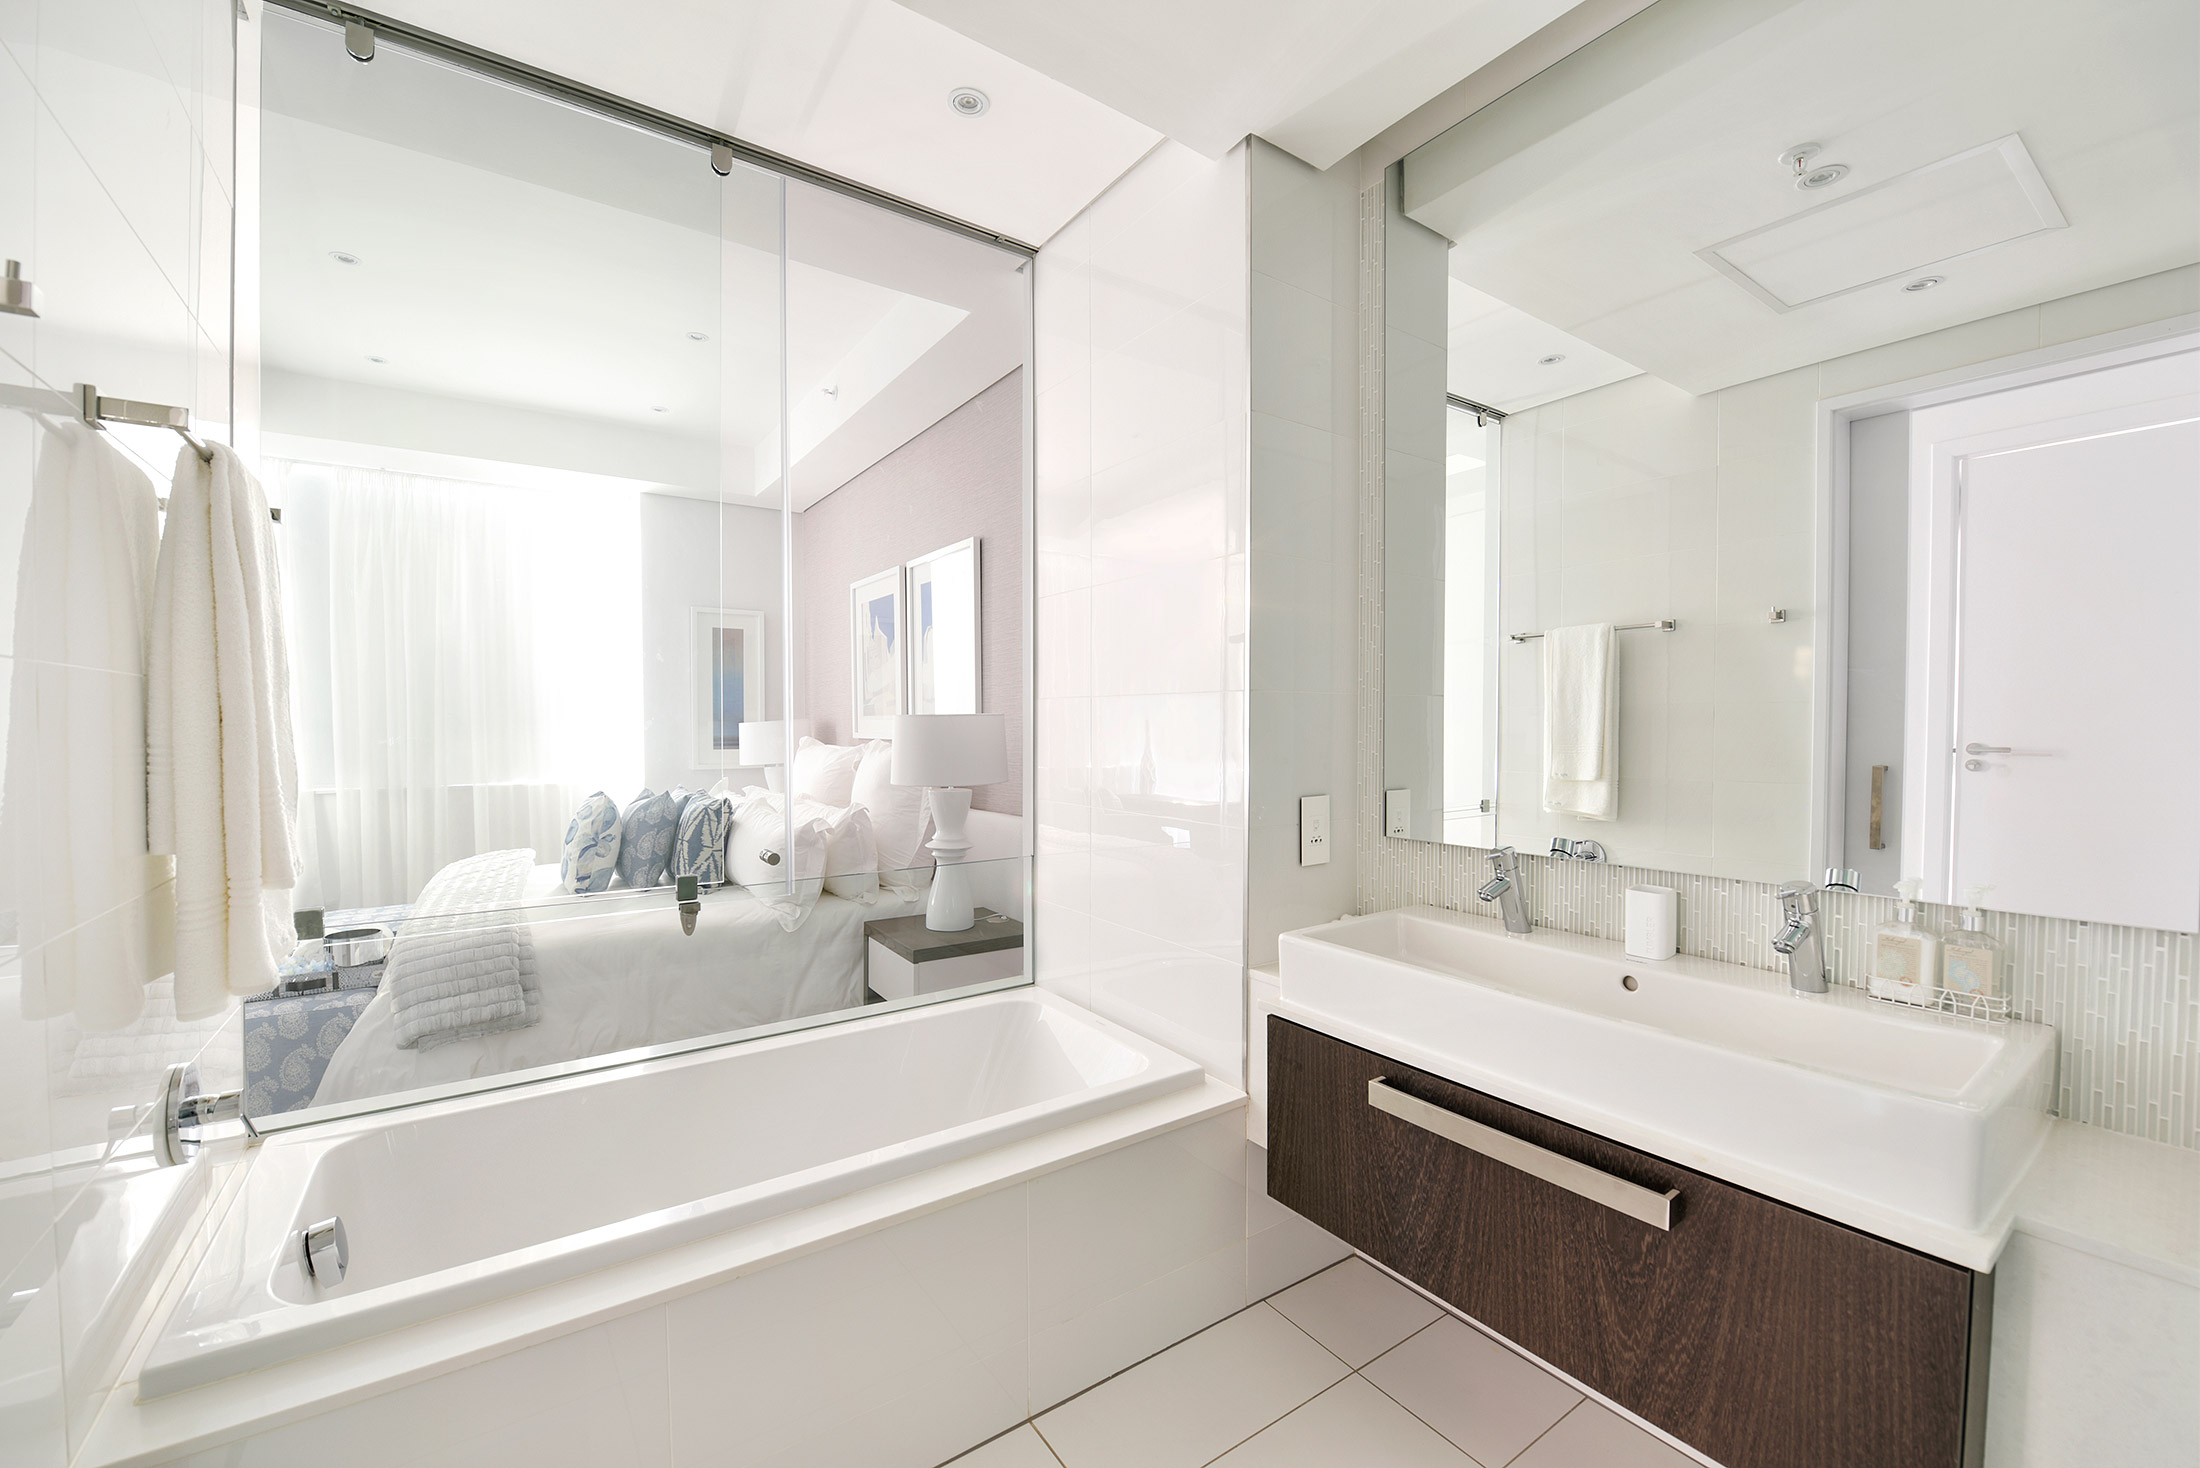 Bathroom Design Johannesburg sandton skye | hansgrohe south africa